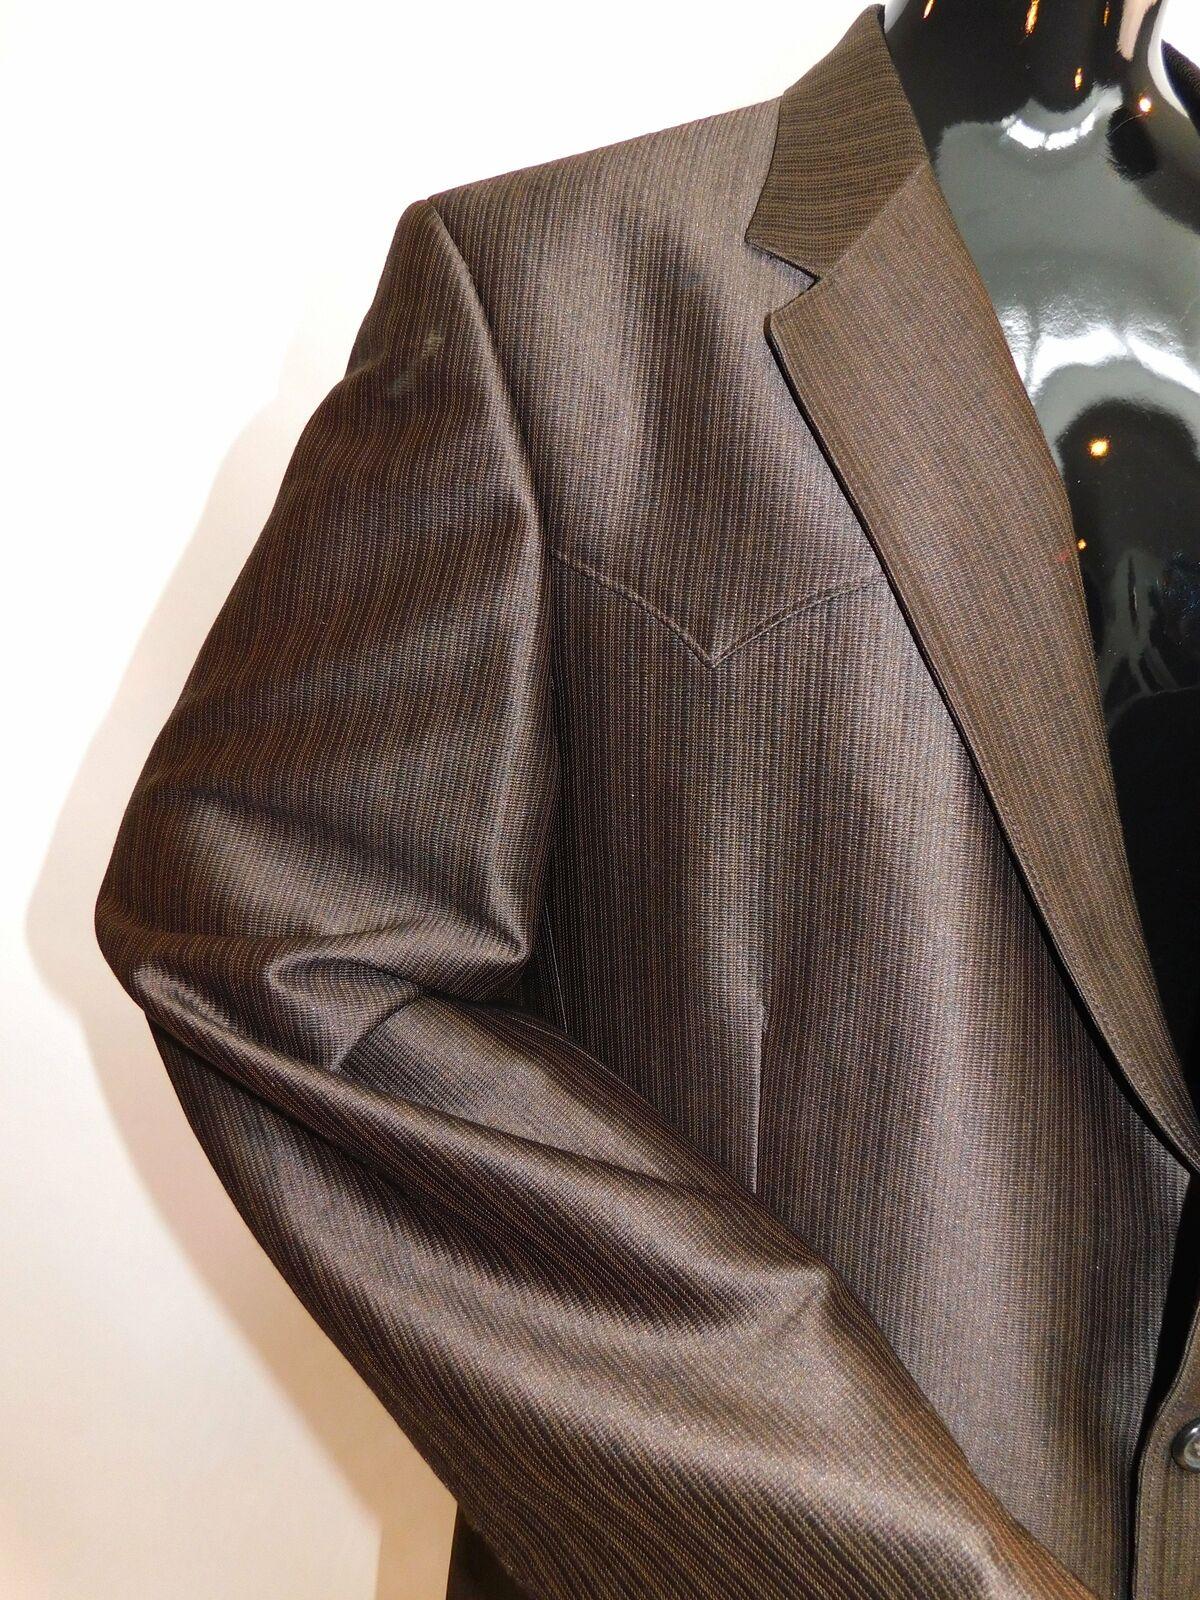 Vintage 1960s Western Suit by H BAR C Ranchwear H… - image 1